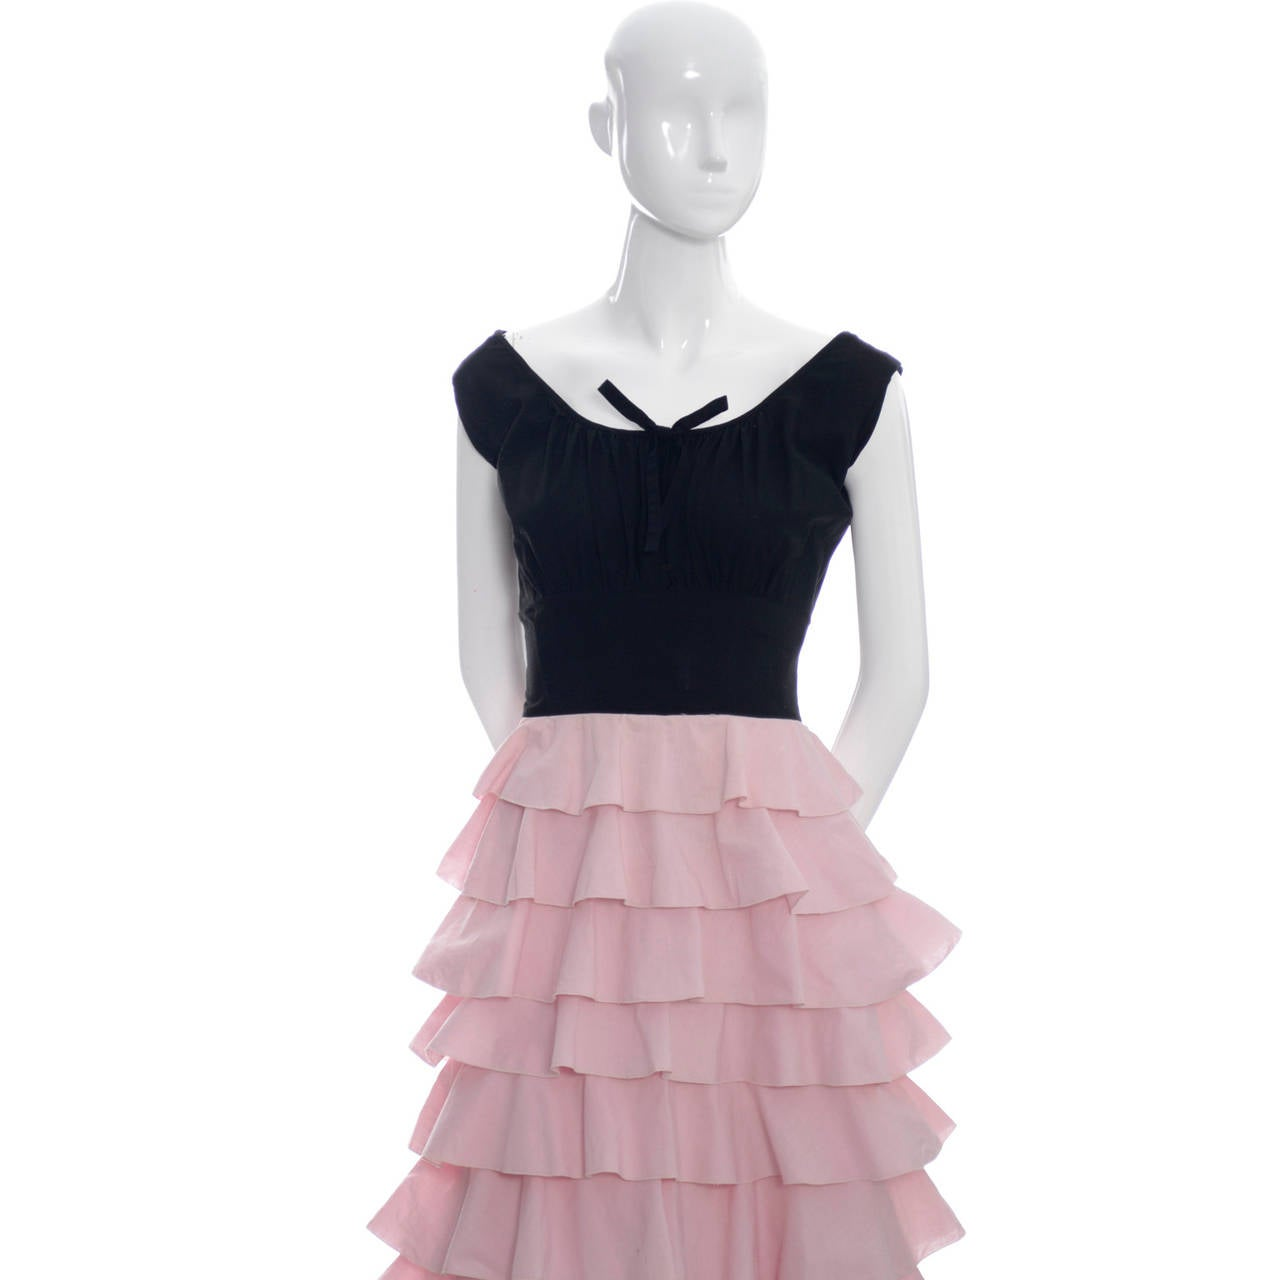 1940s Vintage Gilbert Adrian Original Dress Pink Ruffles Rare Designer Gown 7